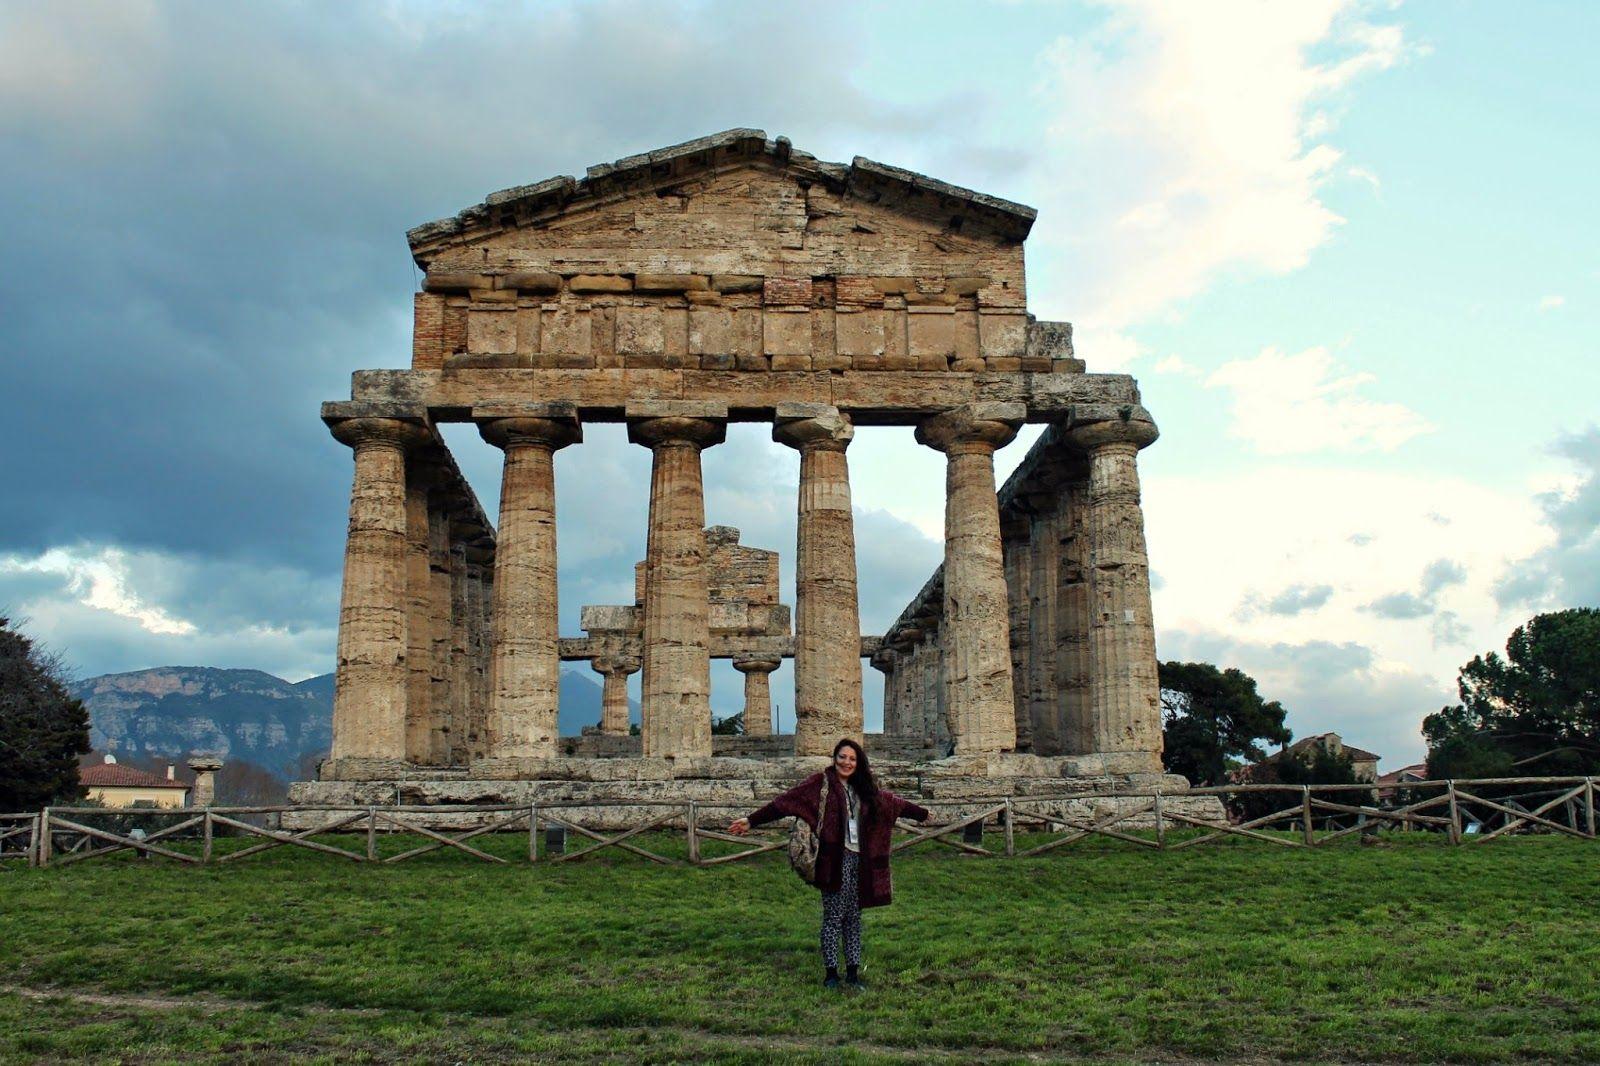 Pensieri in Viaggio: Paestum, un tuffo nel passato